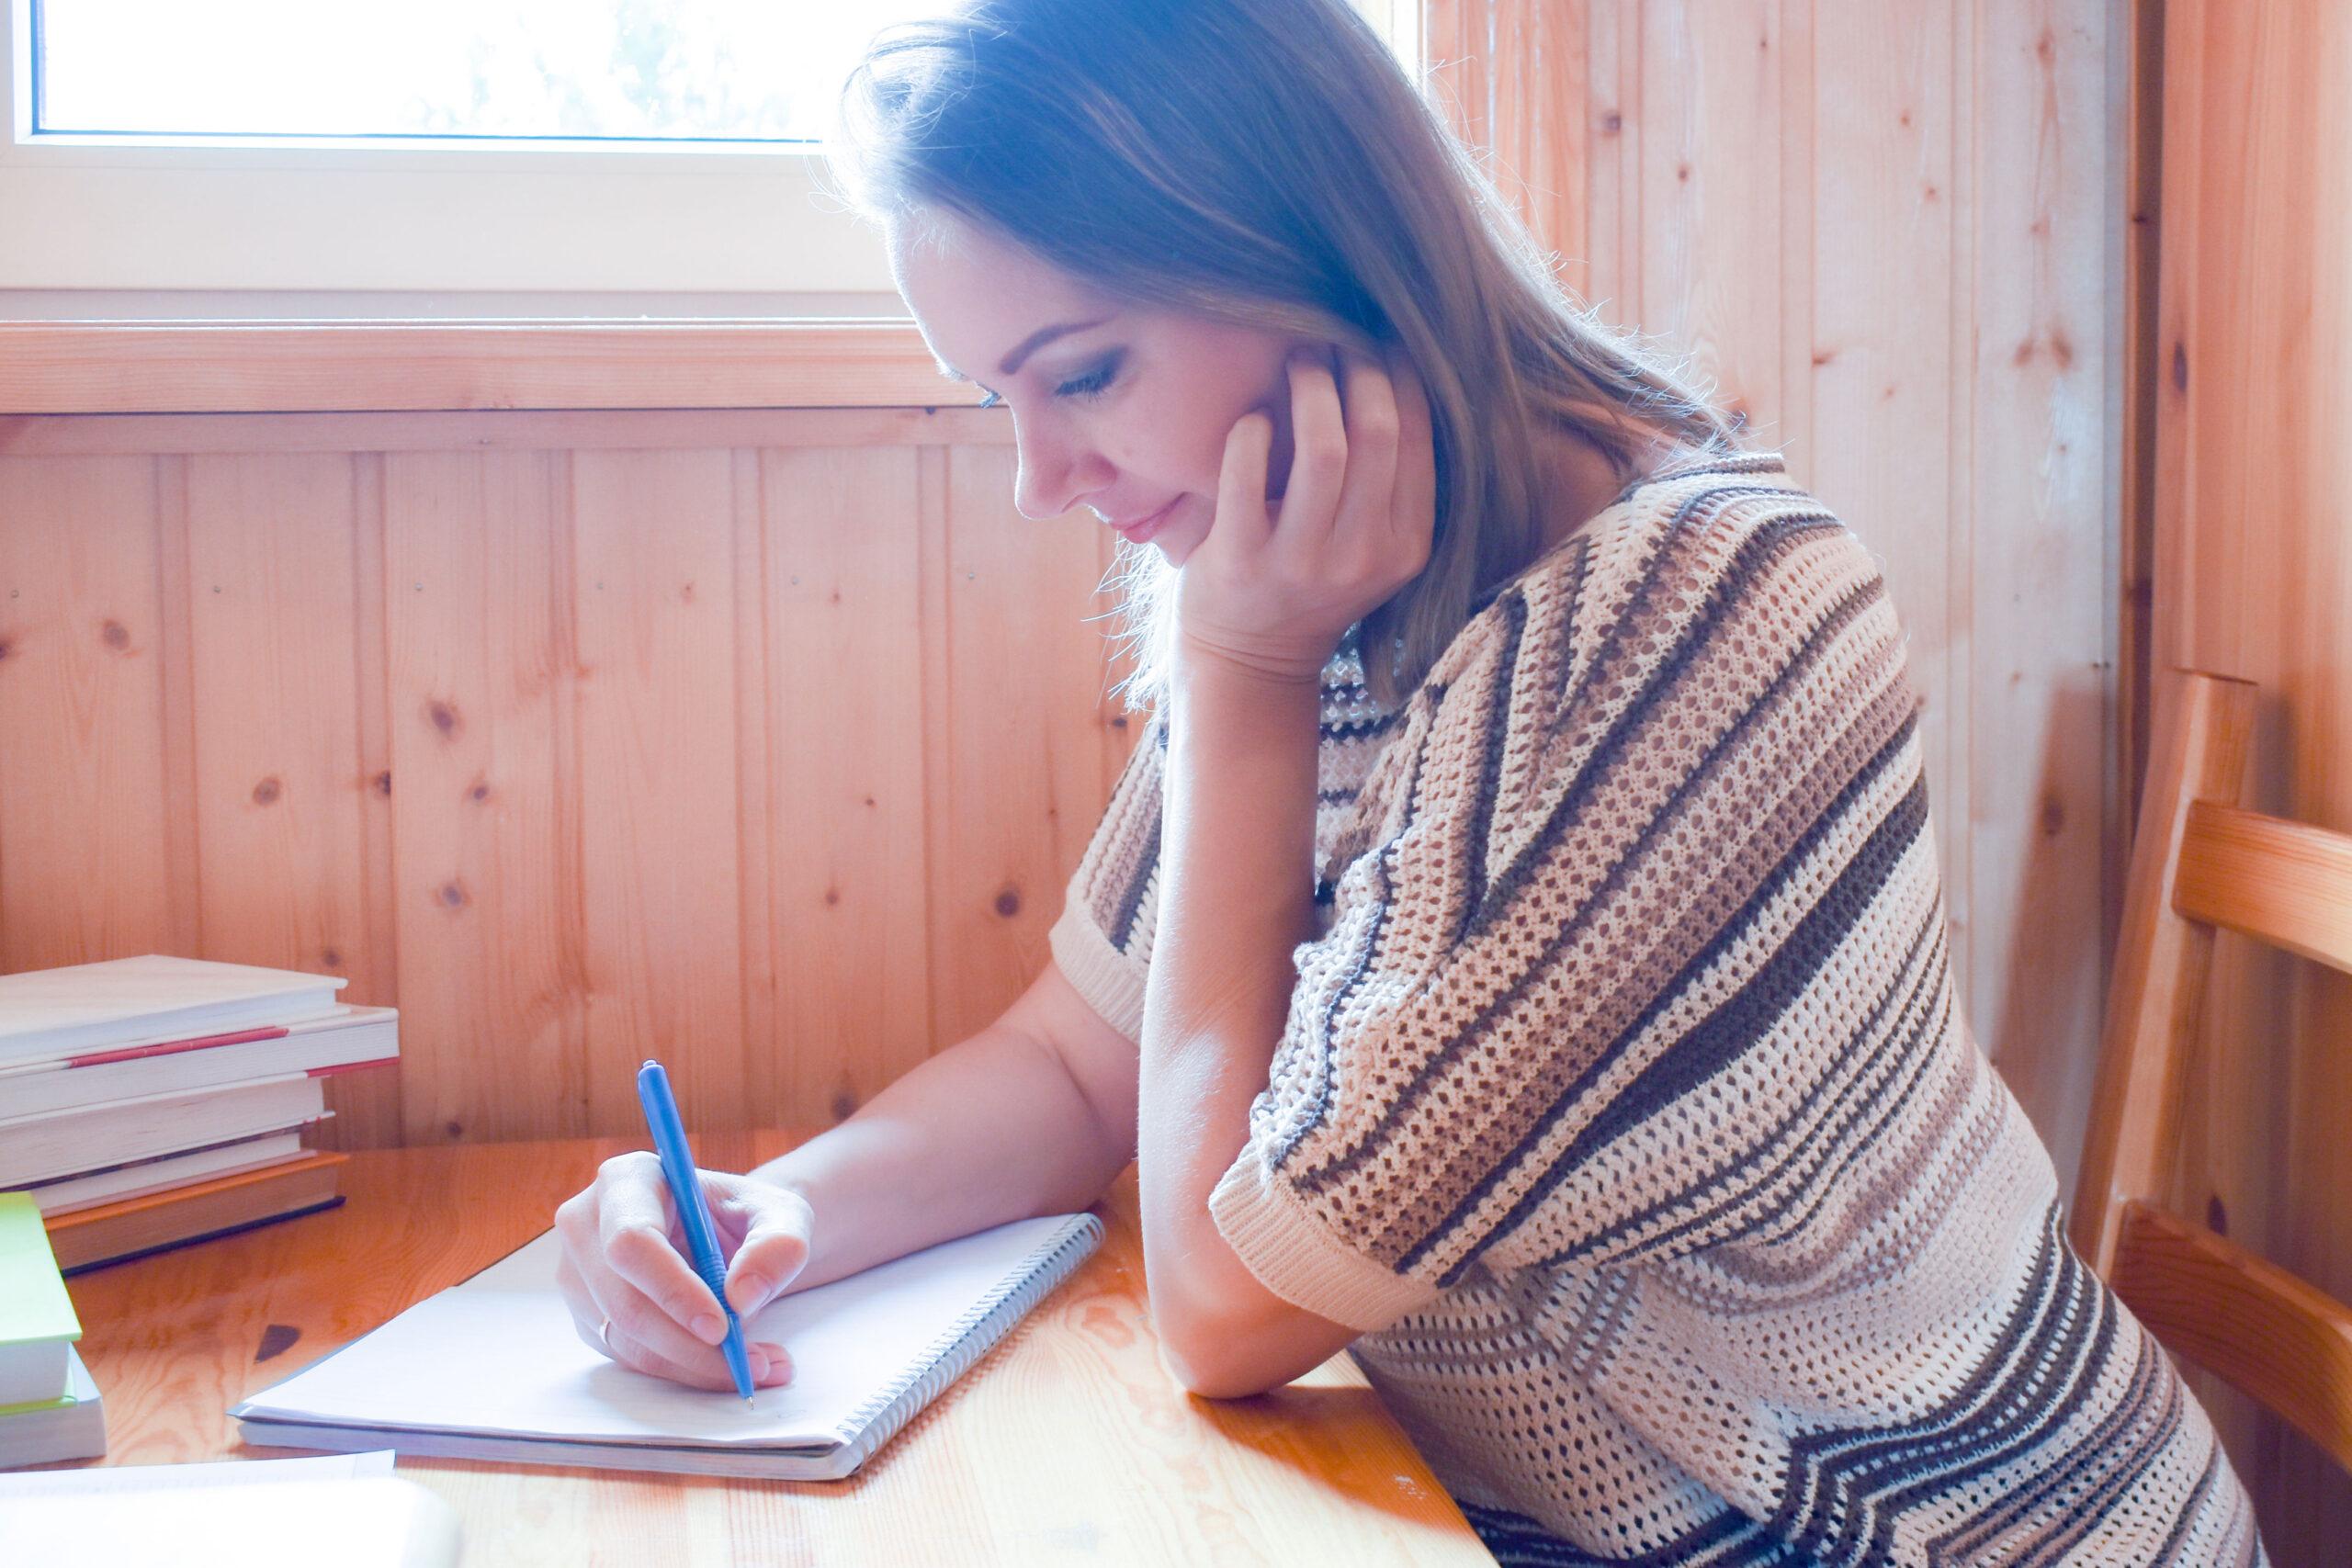 Hvordan skriver man et godt brev formelt språk